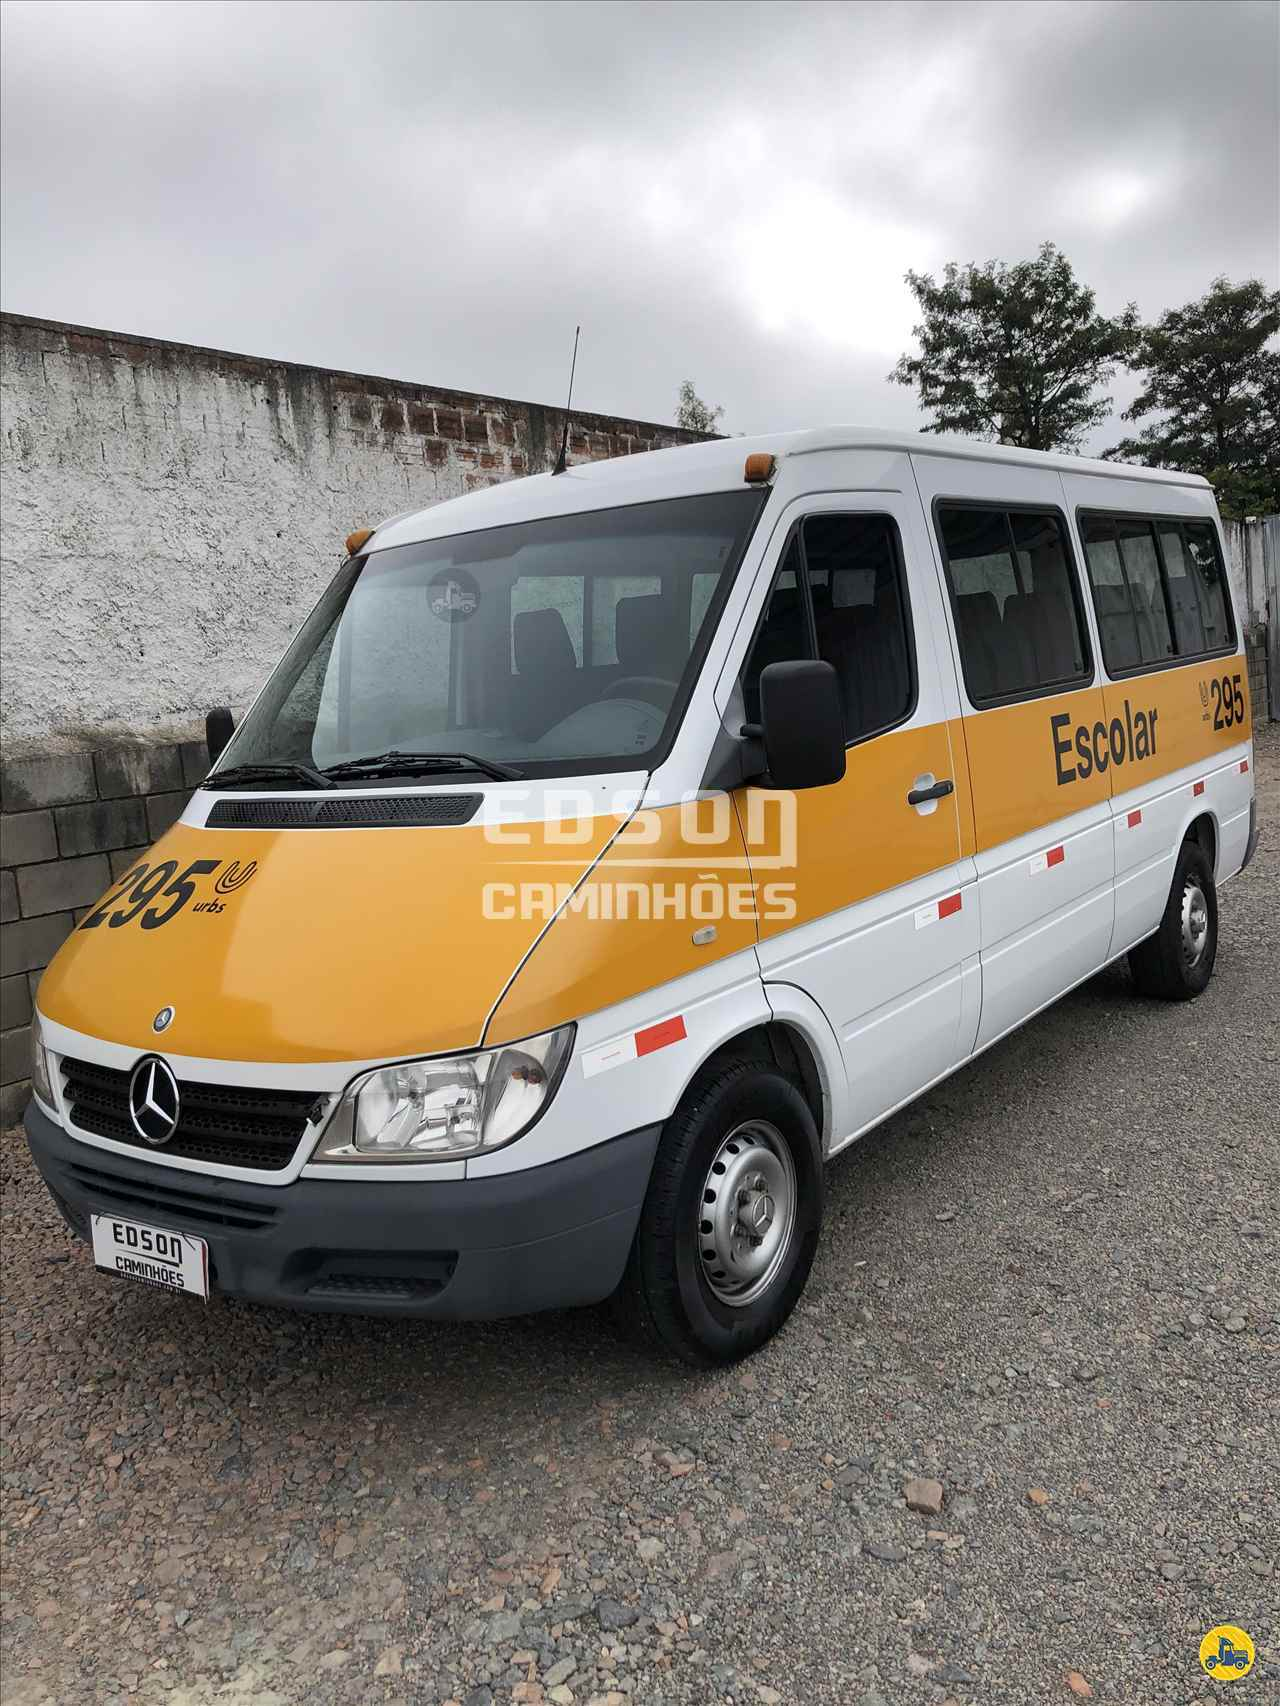 VANS MERCEDES-BENZ Sprinter VAN 313 Edson Caminhões CURITIBA PARANÁ PR